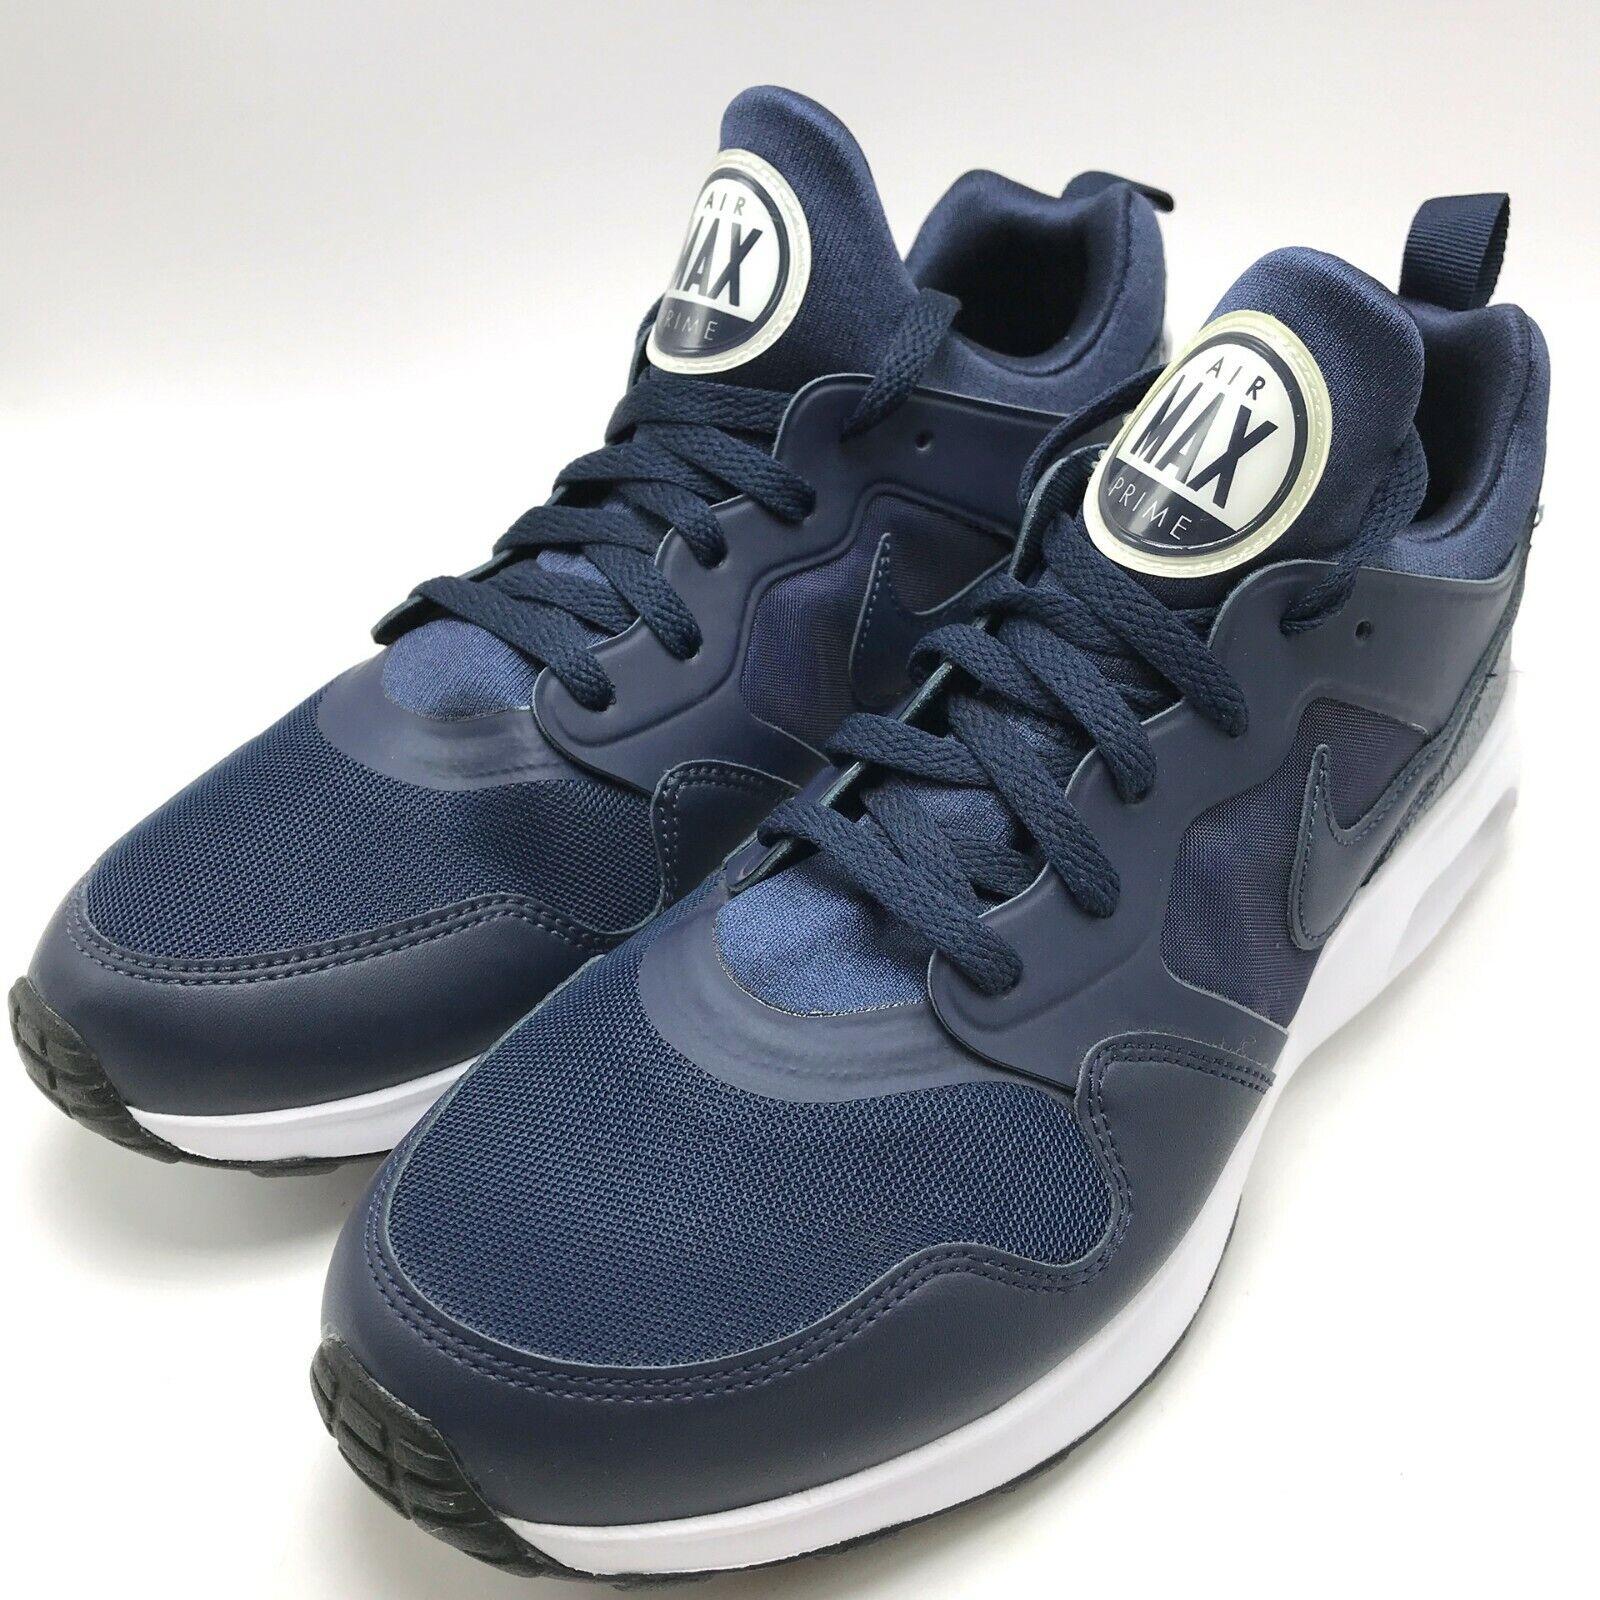 Nike Air Max Prime Men's Running shoes Obsidian Obsidian-White 876068-401